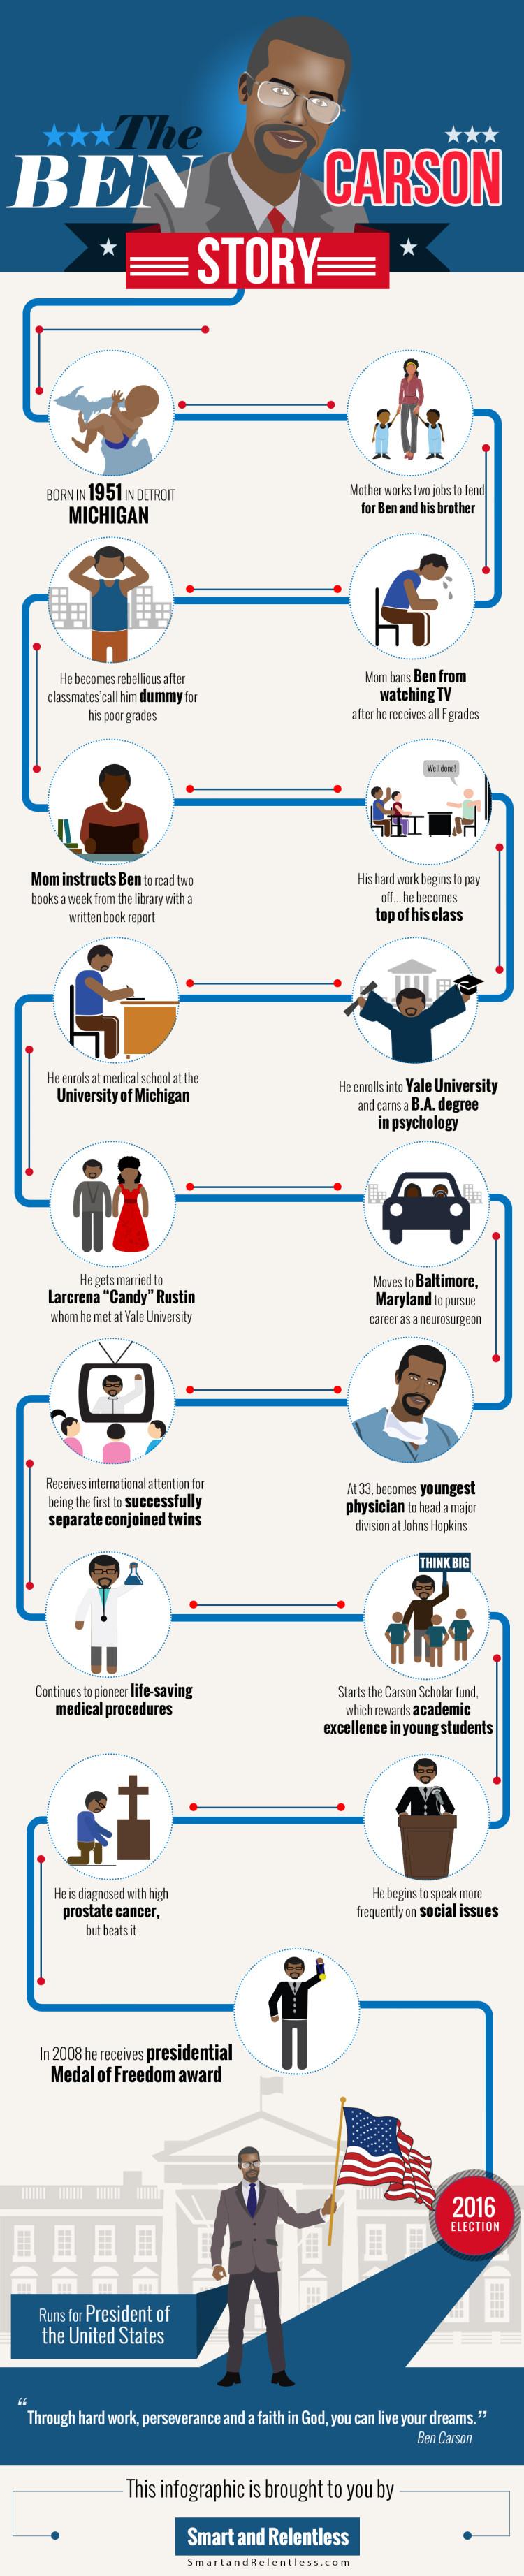 Ben Carson infographic - Smartandrelentless.com